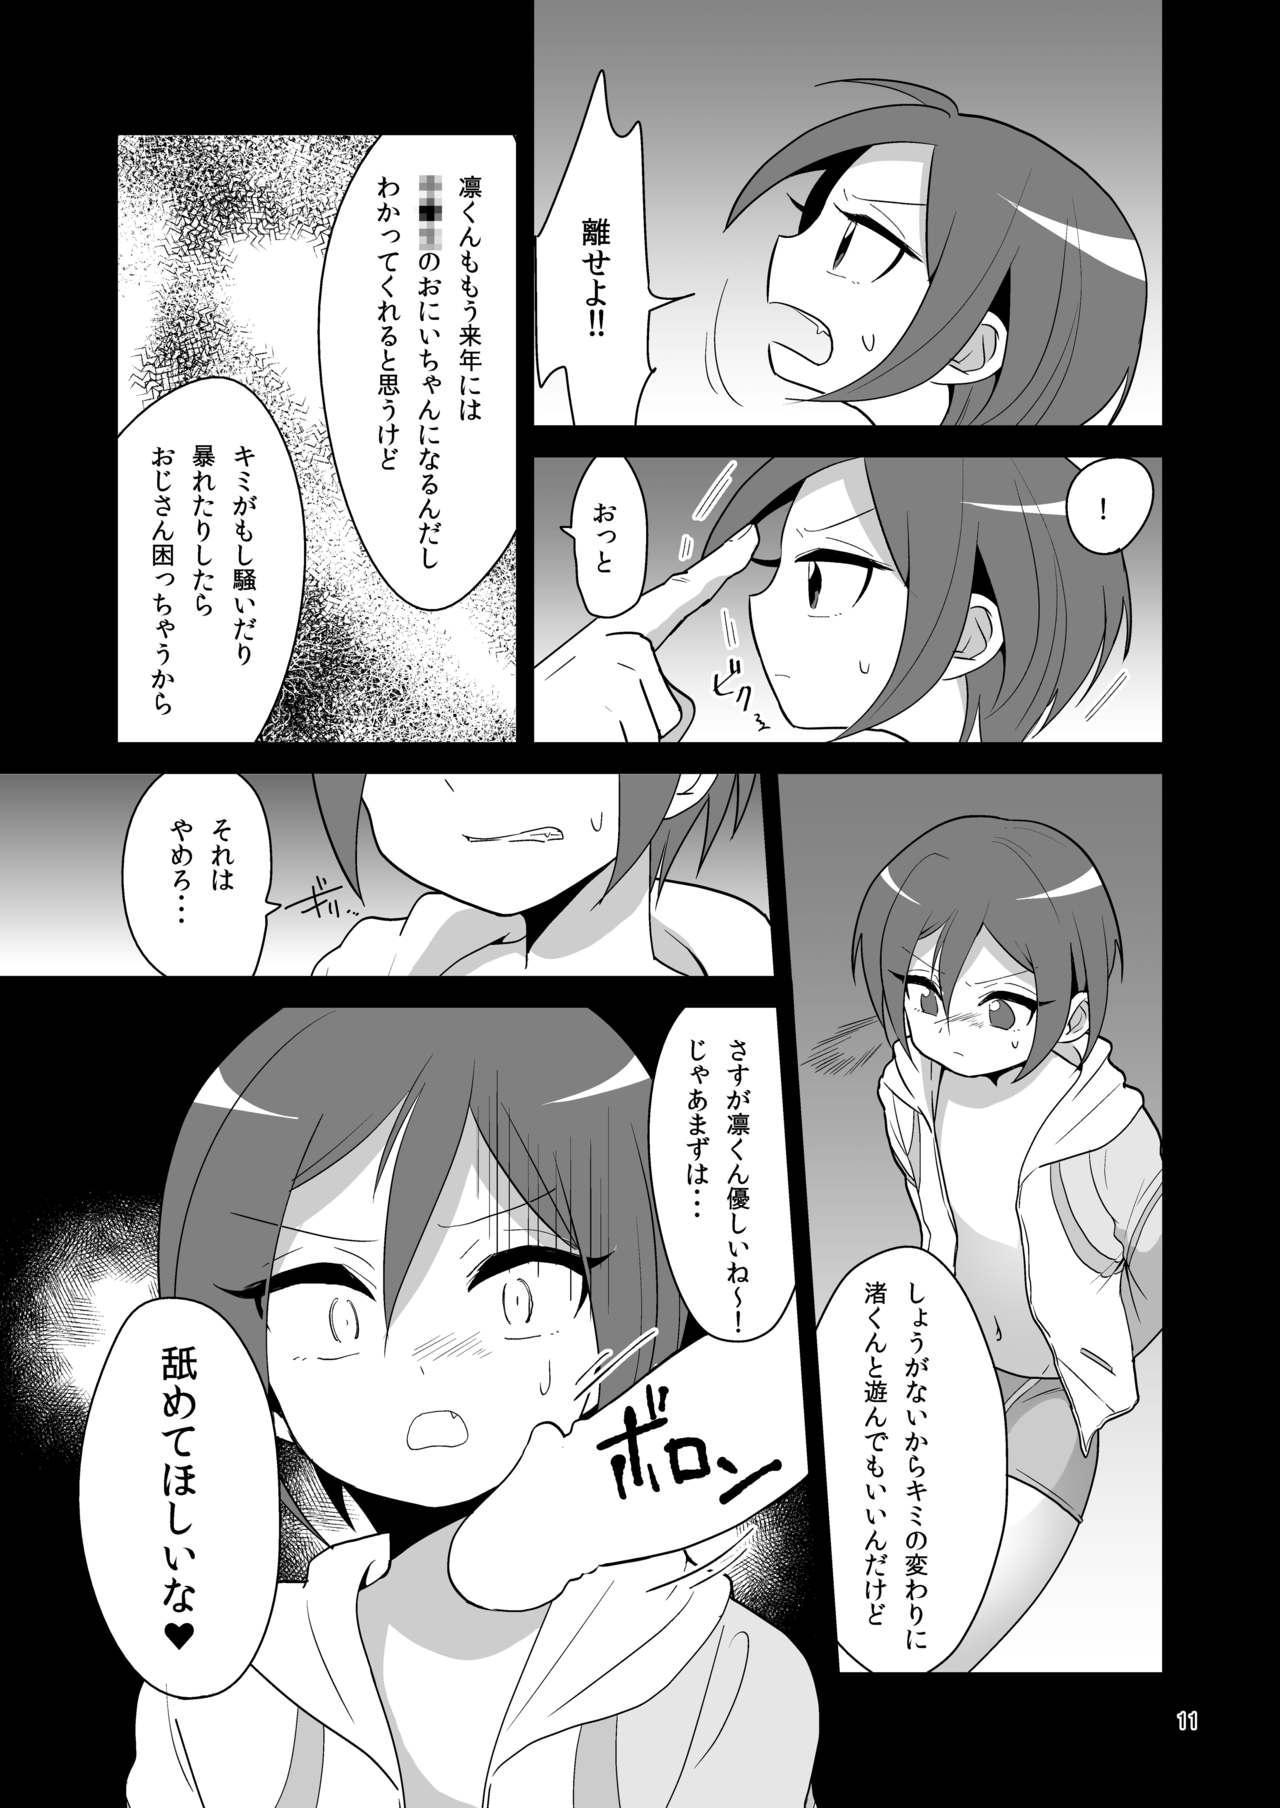 Niji Danshi Rerelease 11